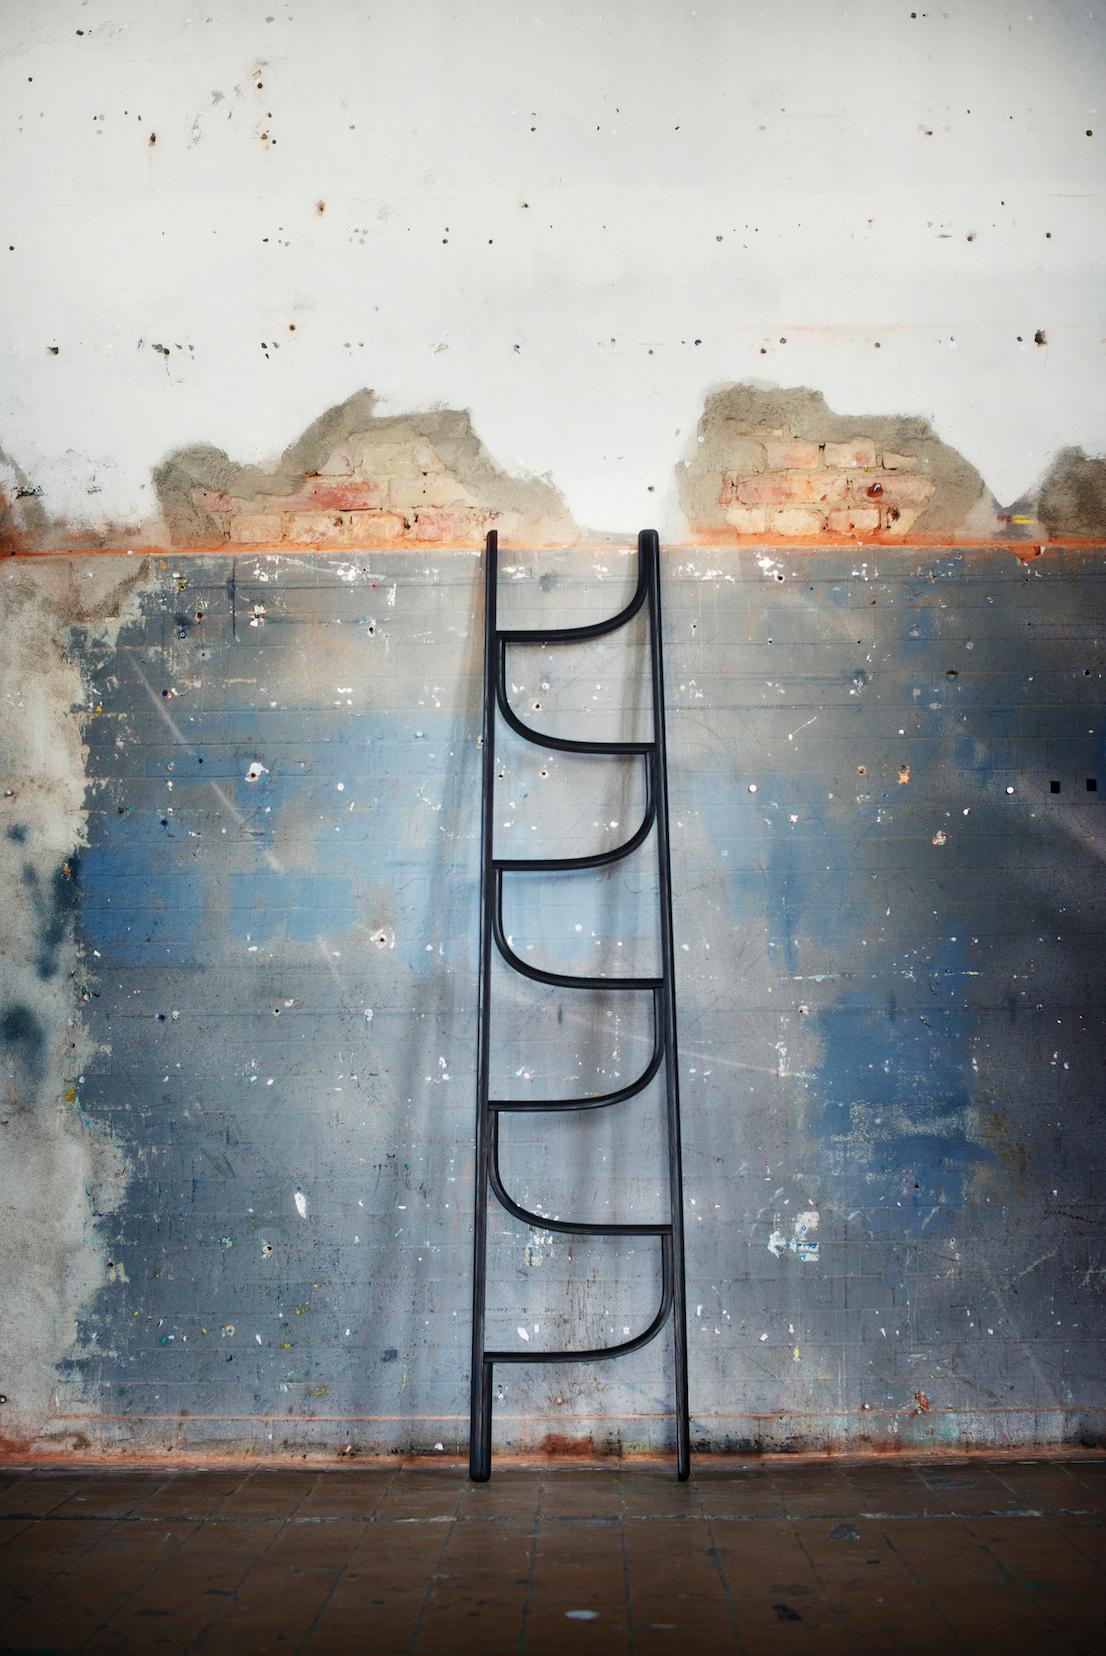 Ladder, Gebrüder Thonet Charlie Styrbjörn Nilsson Necessary #261